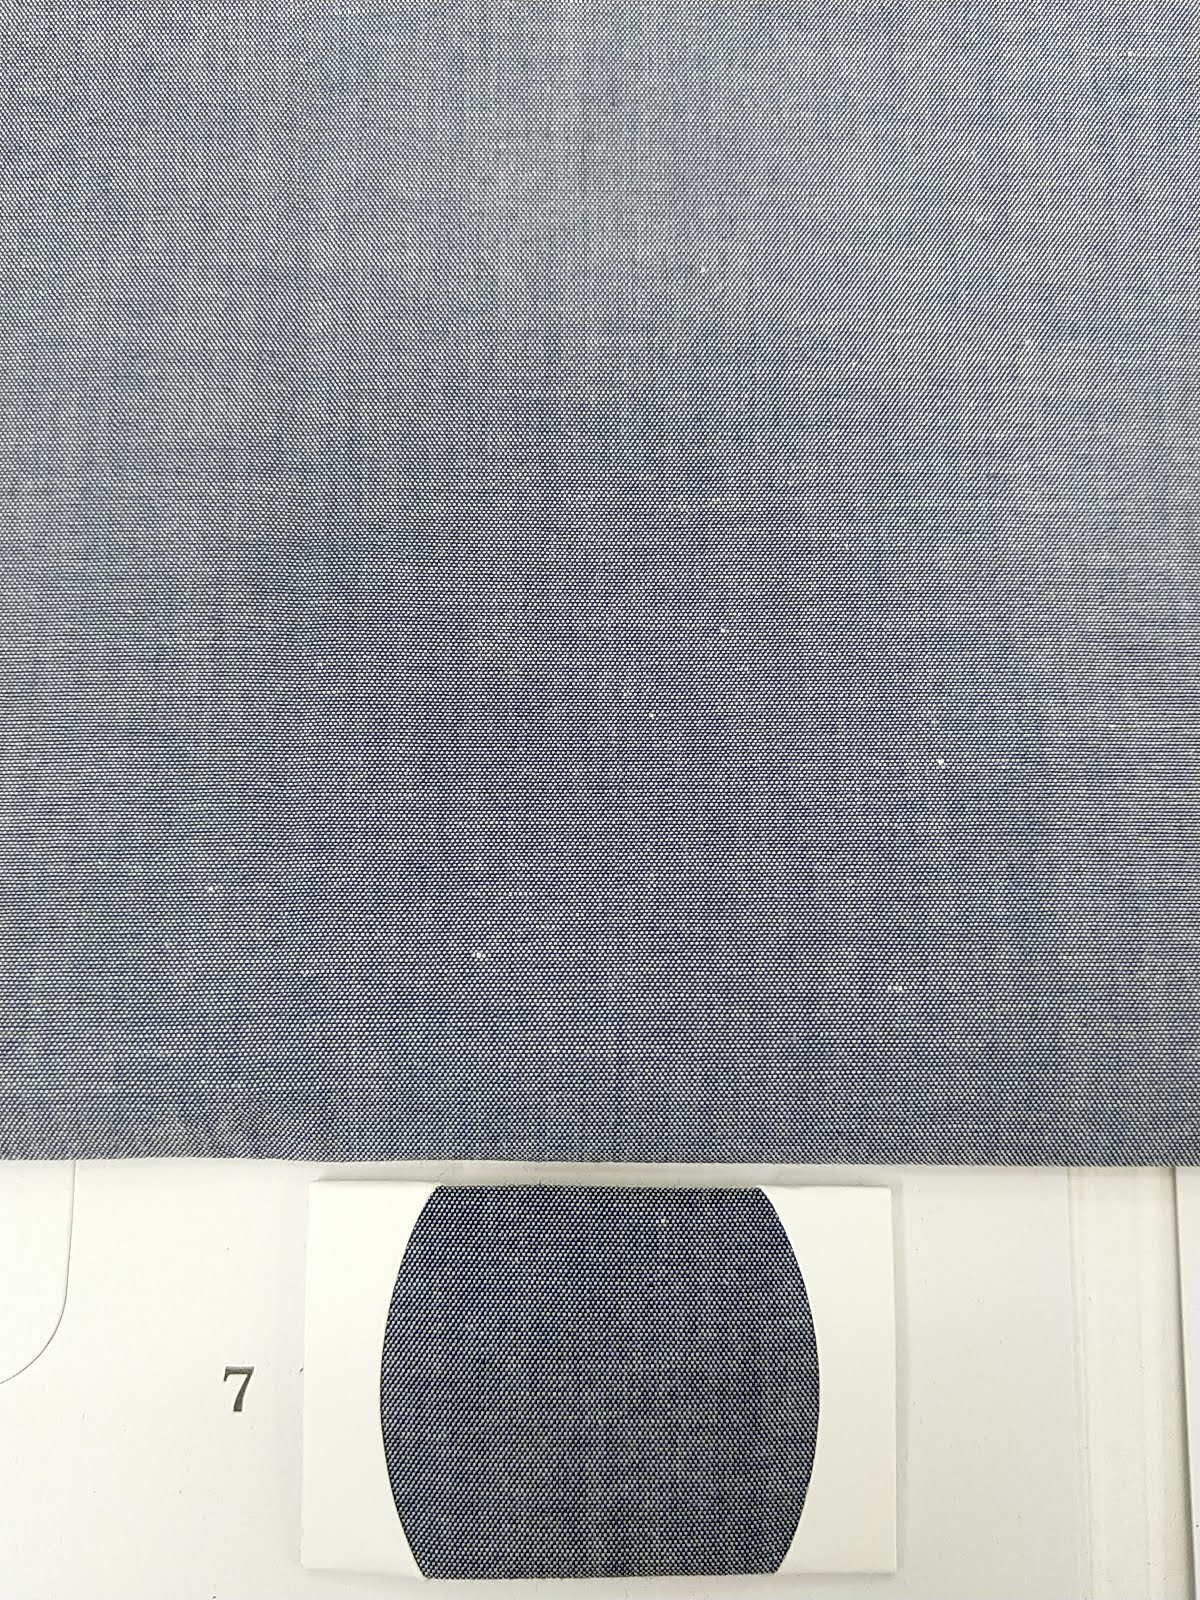 Denim shirt fabric